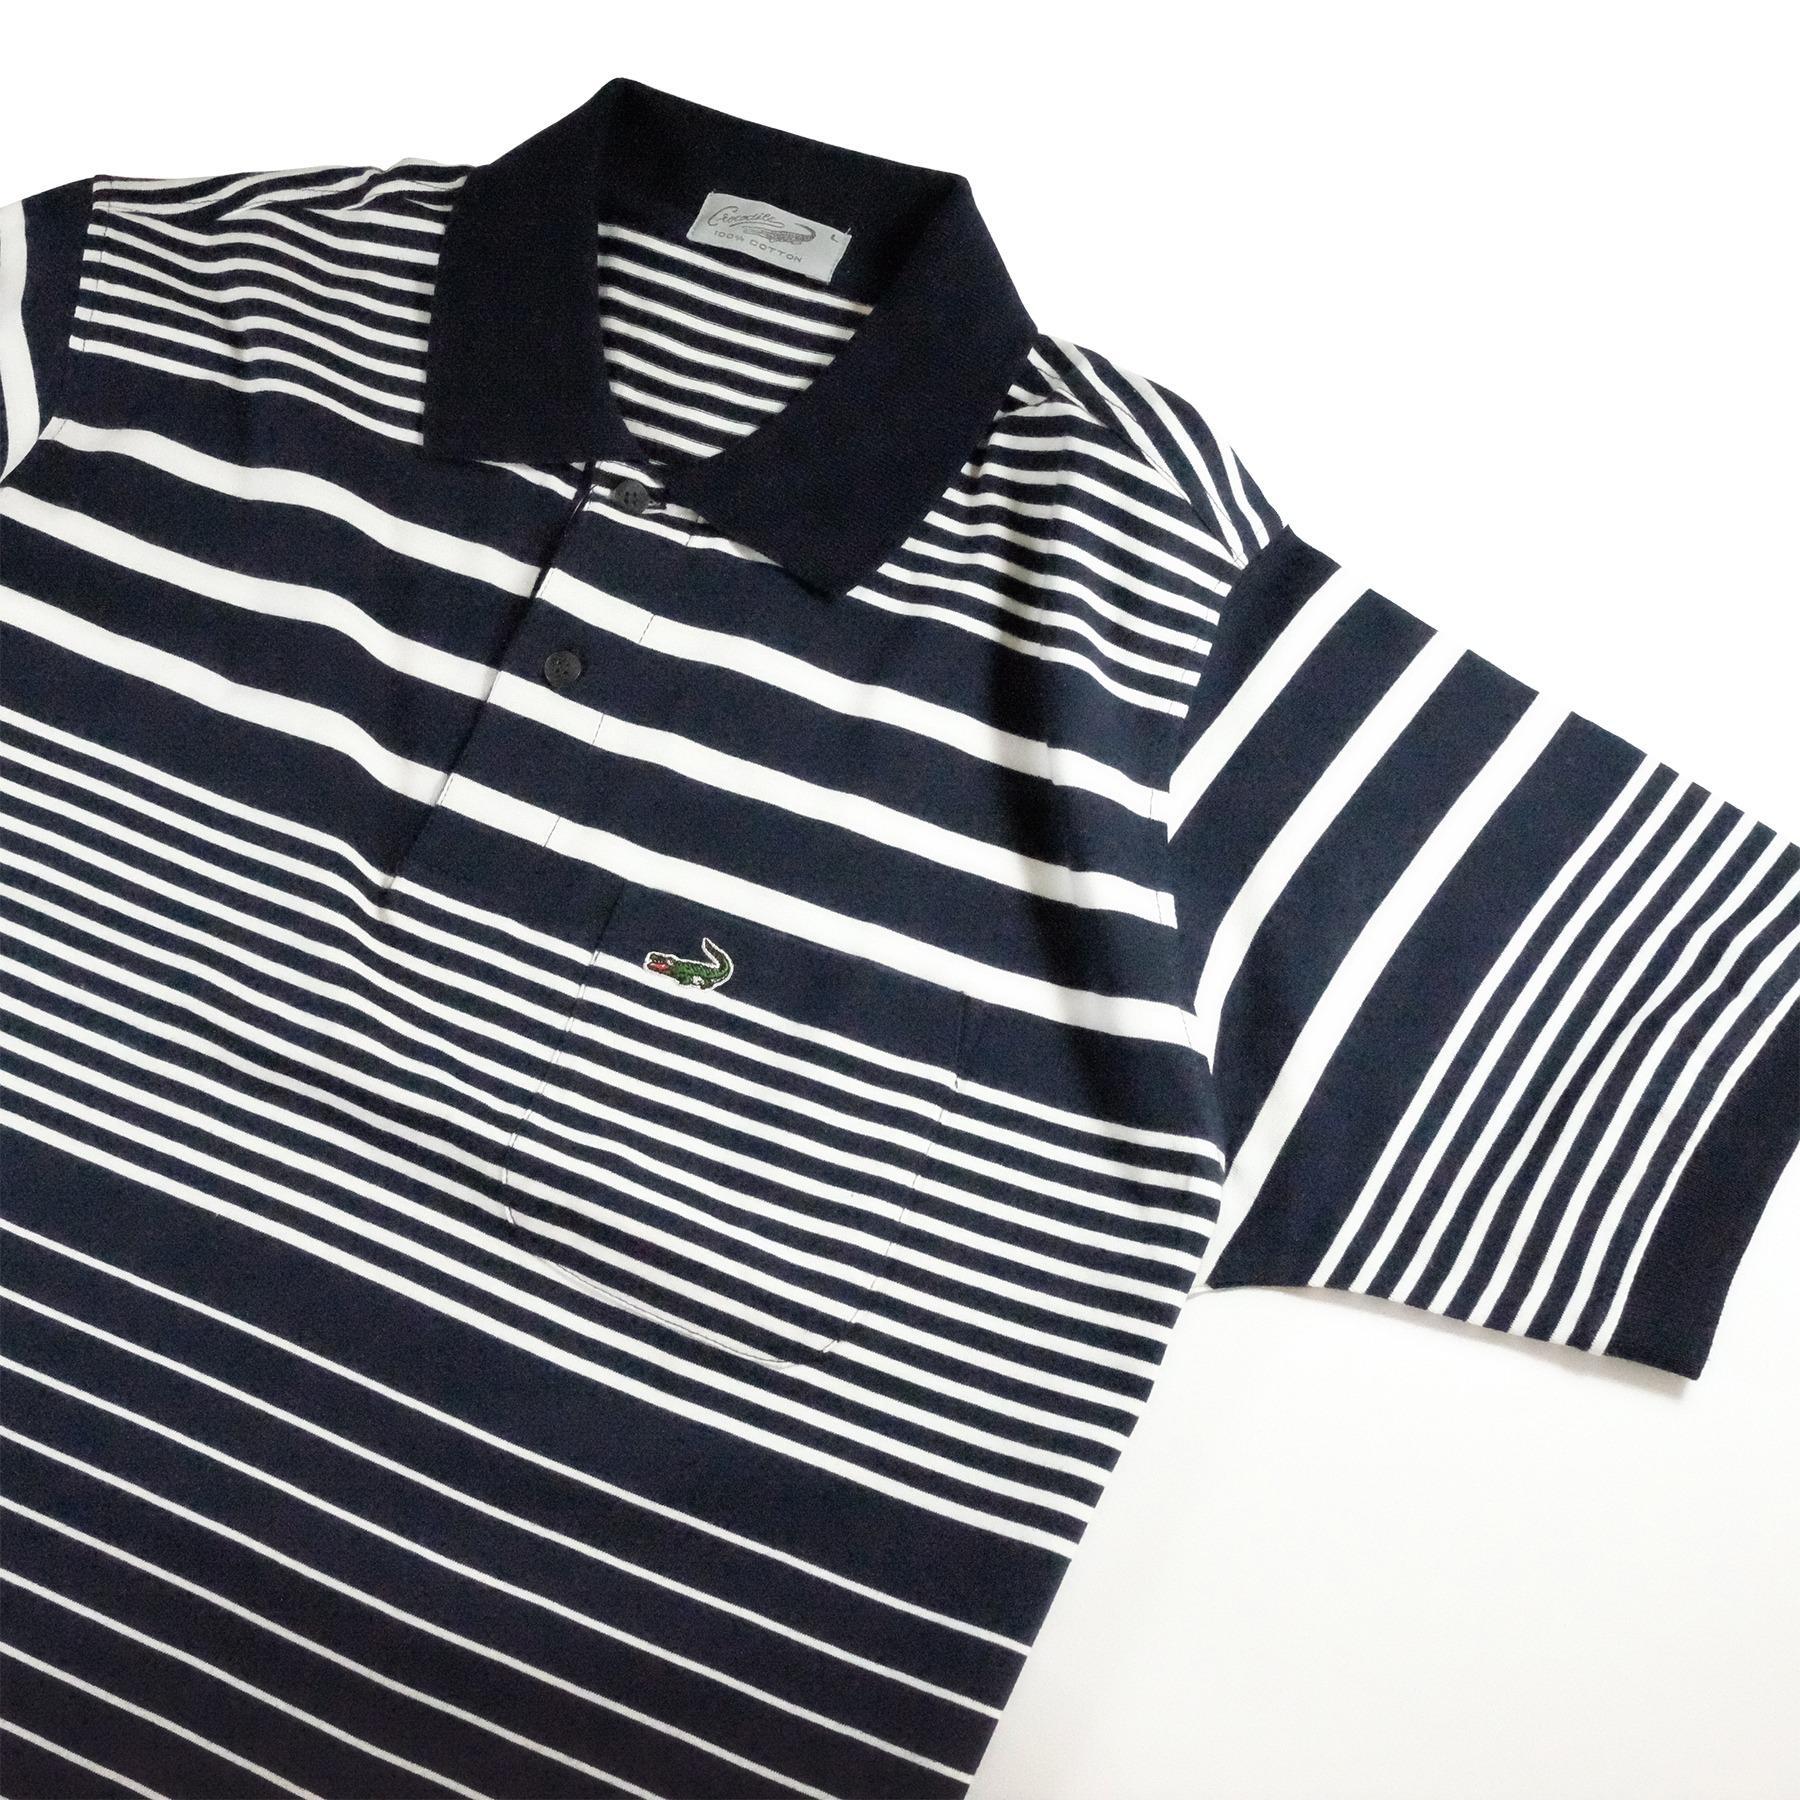 Baju Pria Crocodile Men Premium Polo Shirt Bahan Katun 100 Cotton Palm Relax Fit White L Pepe Dark Navy